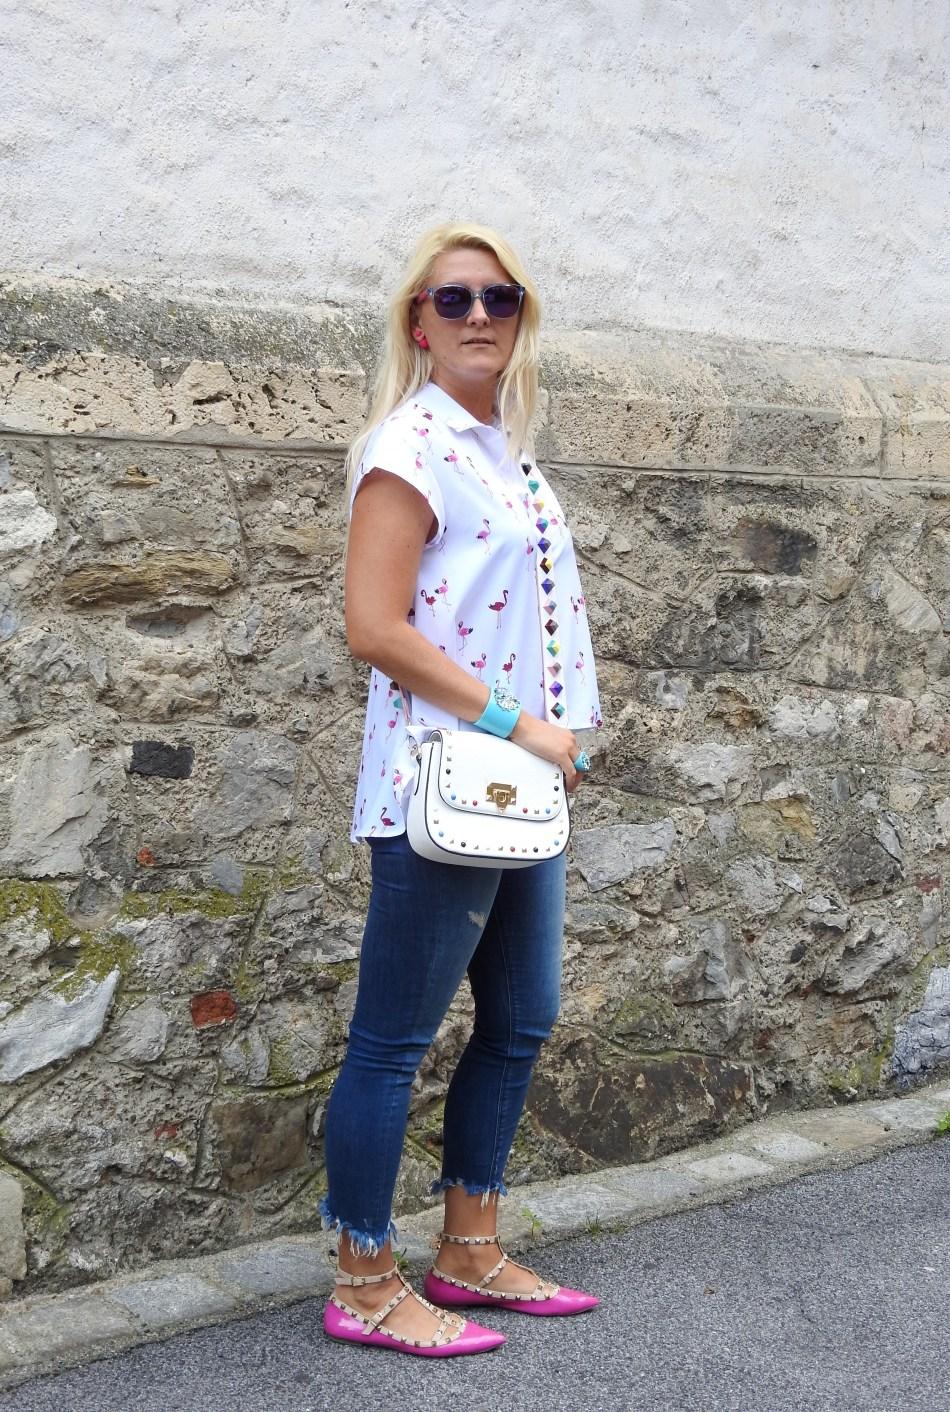 Flamingo-Blouse-Fringed-Jeans-Denim-Valentino-Rockstuds-Bag-Shoes-carrieslifestyle-Tamara-Prutsch